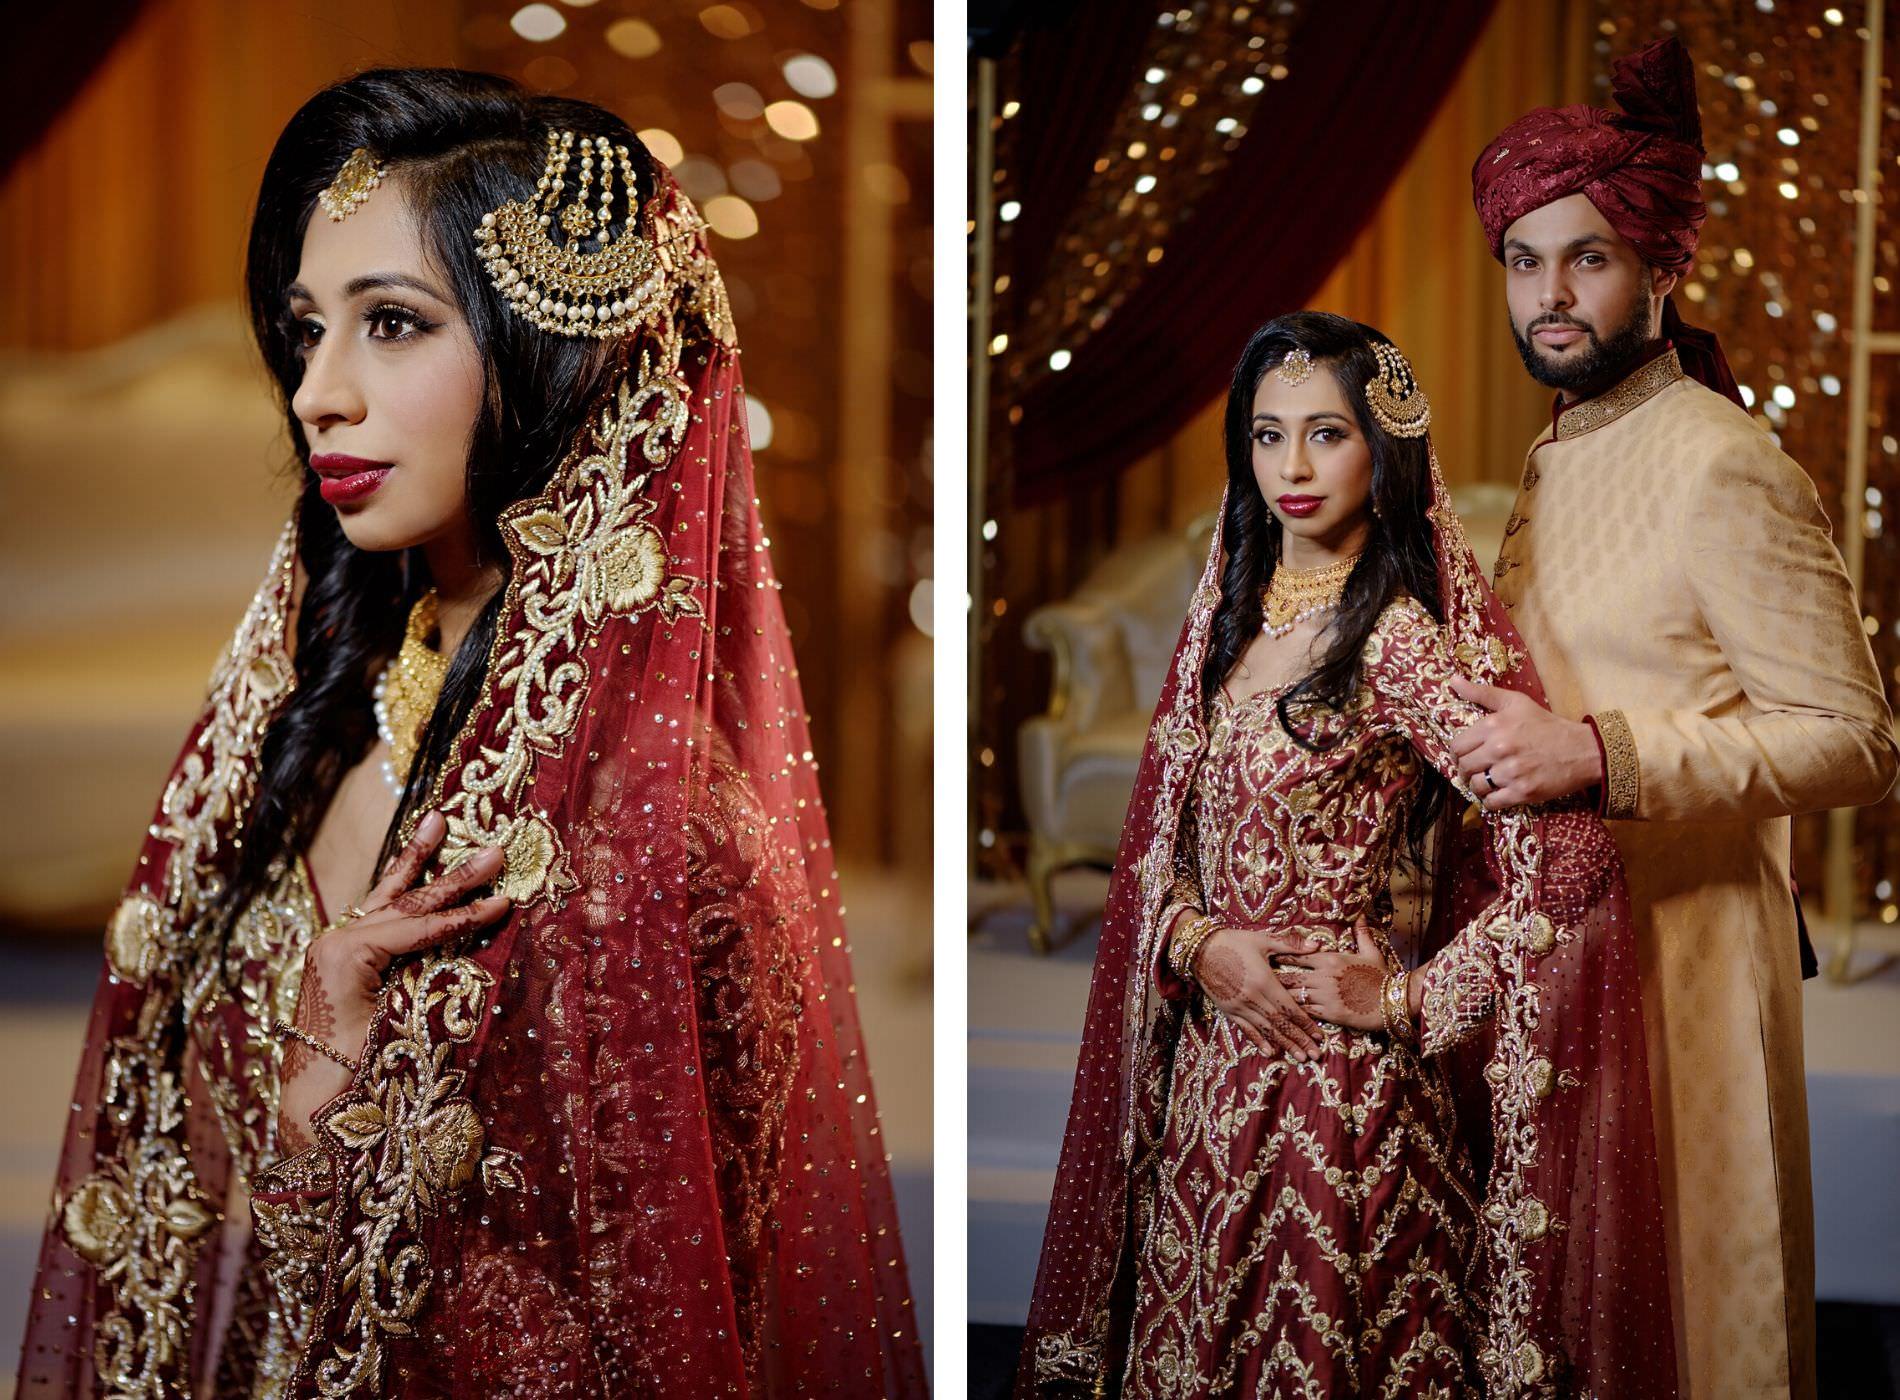 Florida Indian Wedding Bride and Groom Portraits | Deep Red Burgundy and Gold Wedding Bridal Sari and Groom Kurta | Tampa Bay Wedding Hair and Makeup Artist Michele Renee the Studio